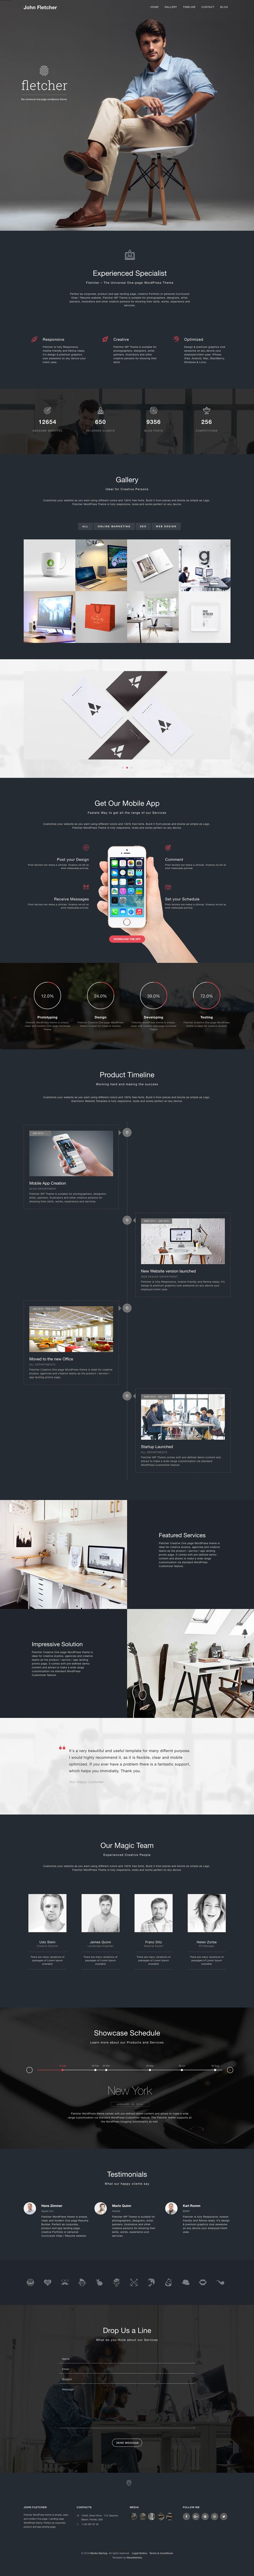 gs 0343 series sample resume%0A Best     Online portfolio examples ideas on Pinterest   Graphic design  portfolios  Template portfolio and Graphic design templates